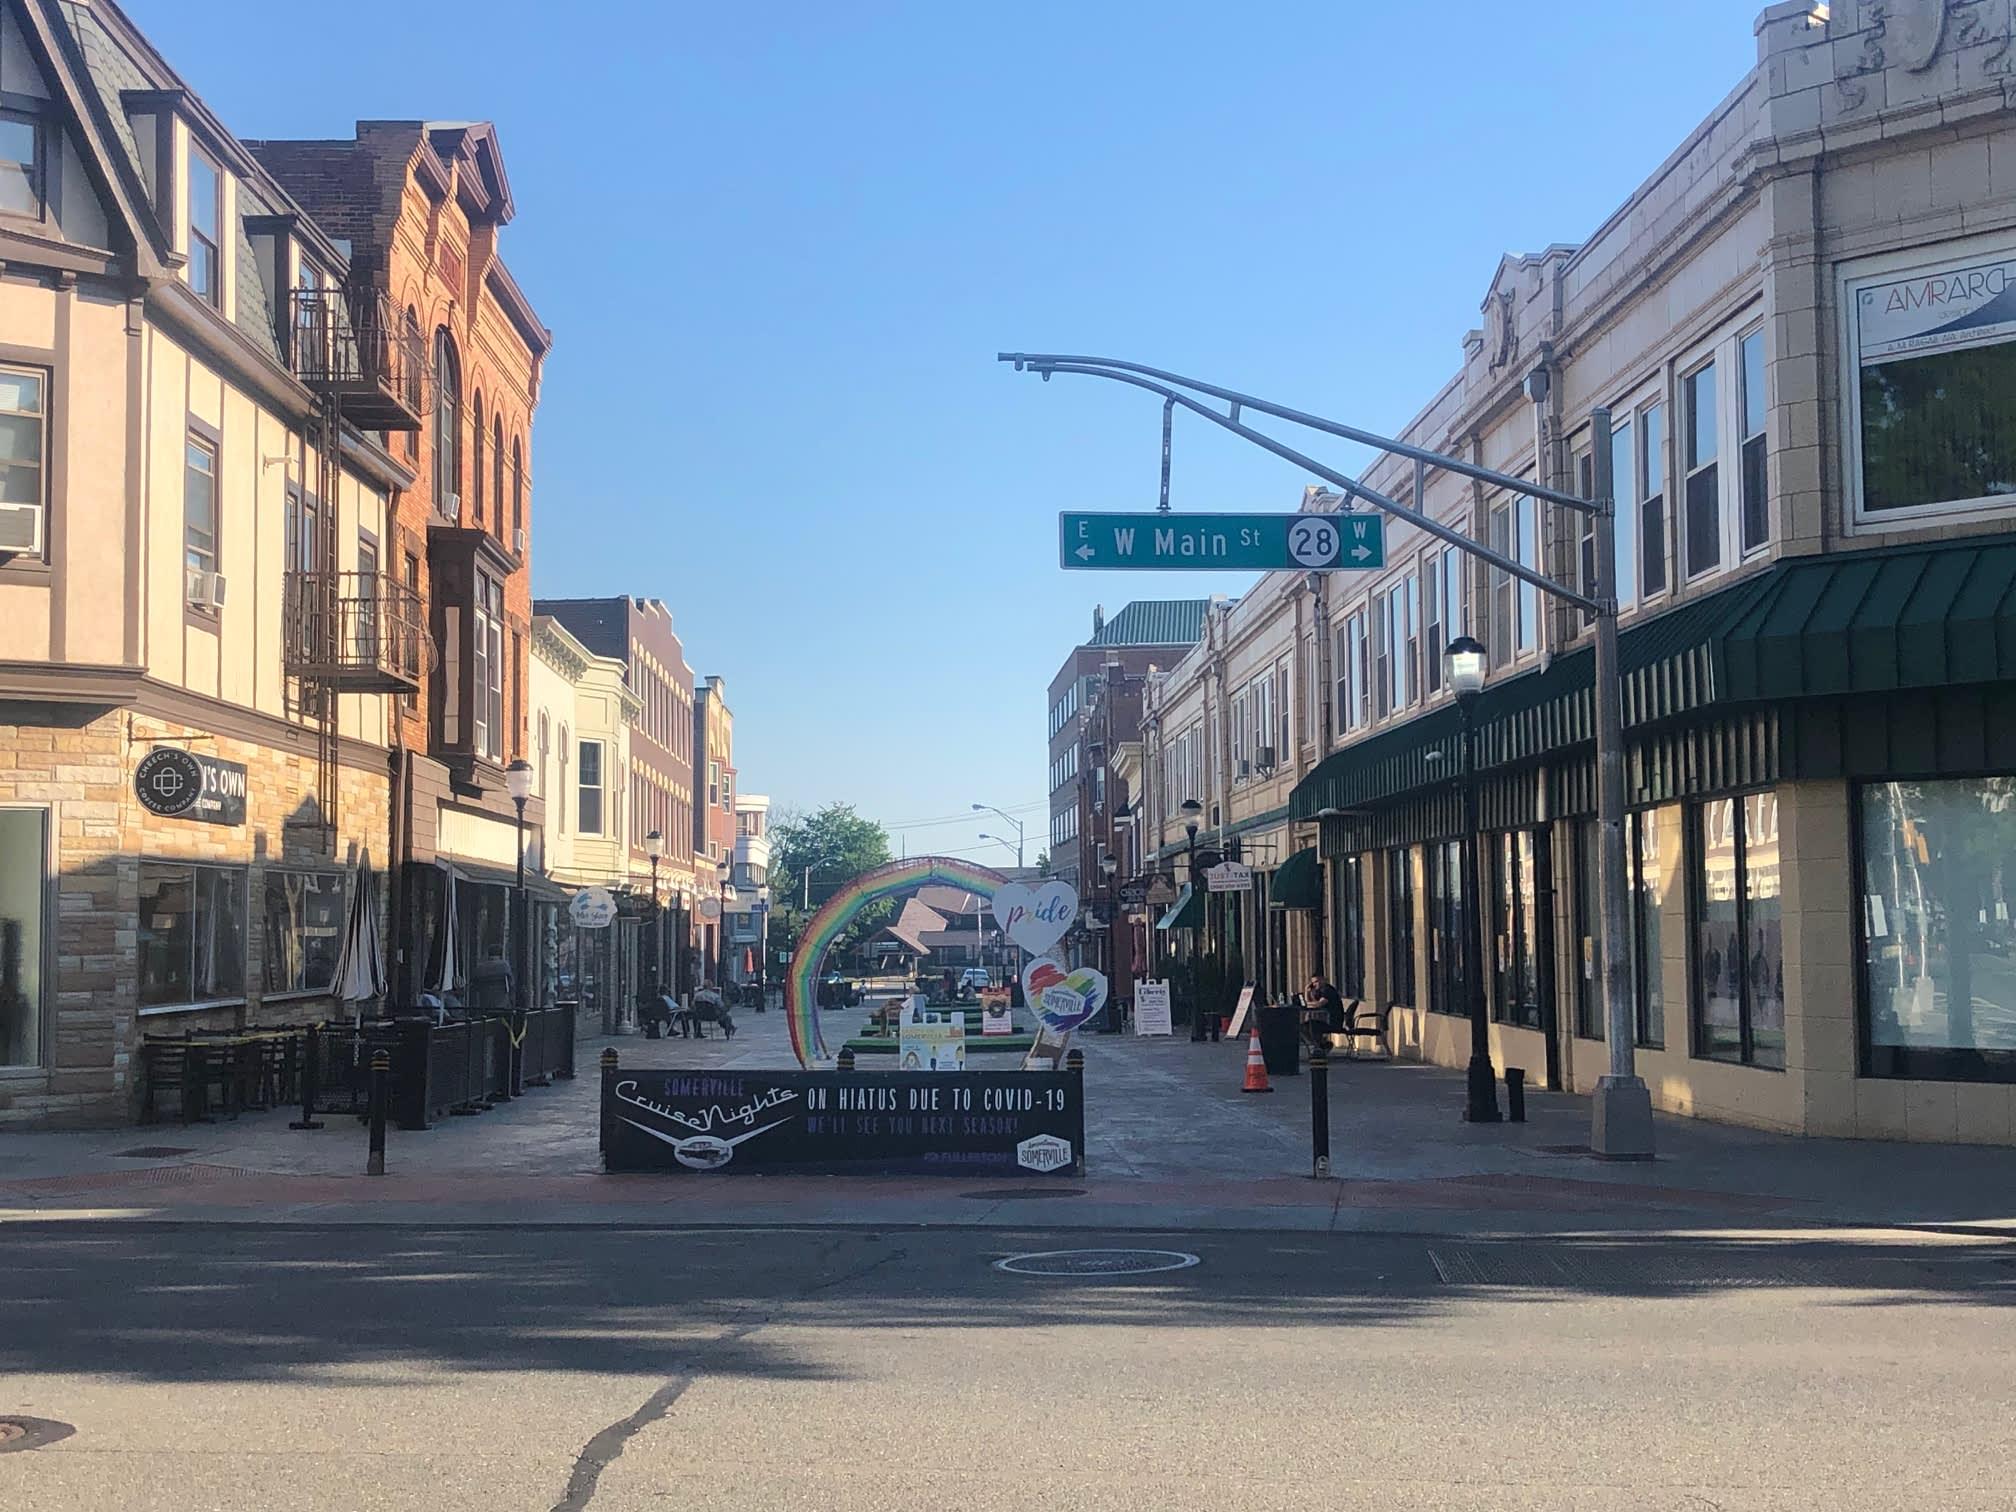 How one NJ Main Street reopens as coronavirus rules ease